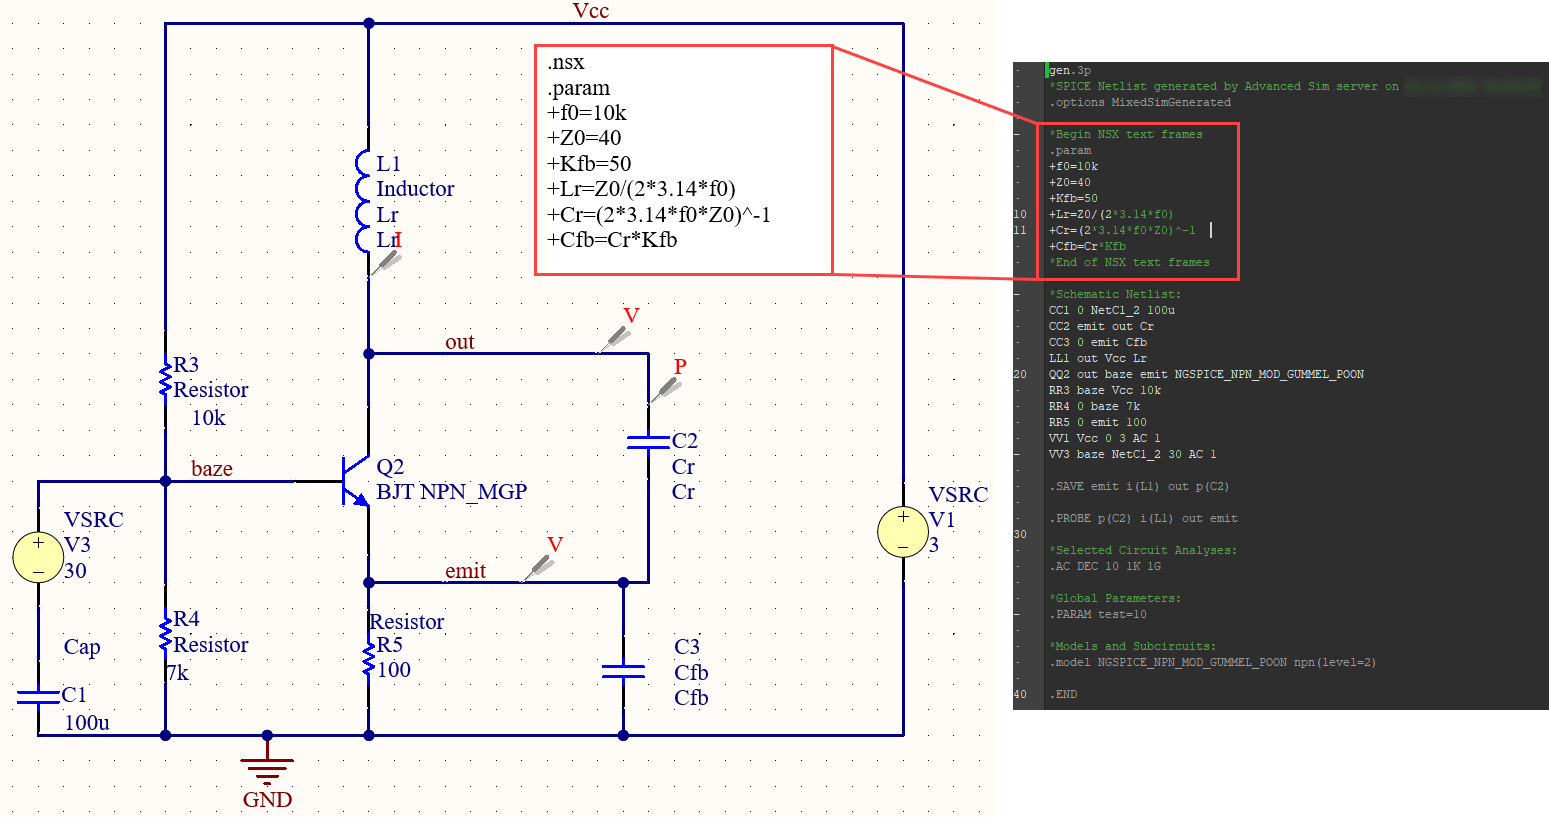 Figure 32. Display area of user SPICE code in the netlist.